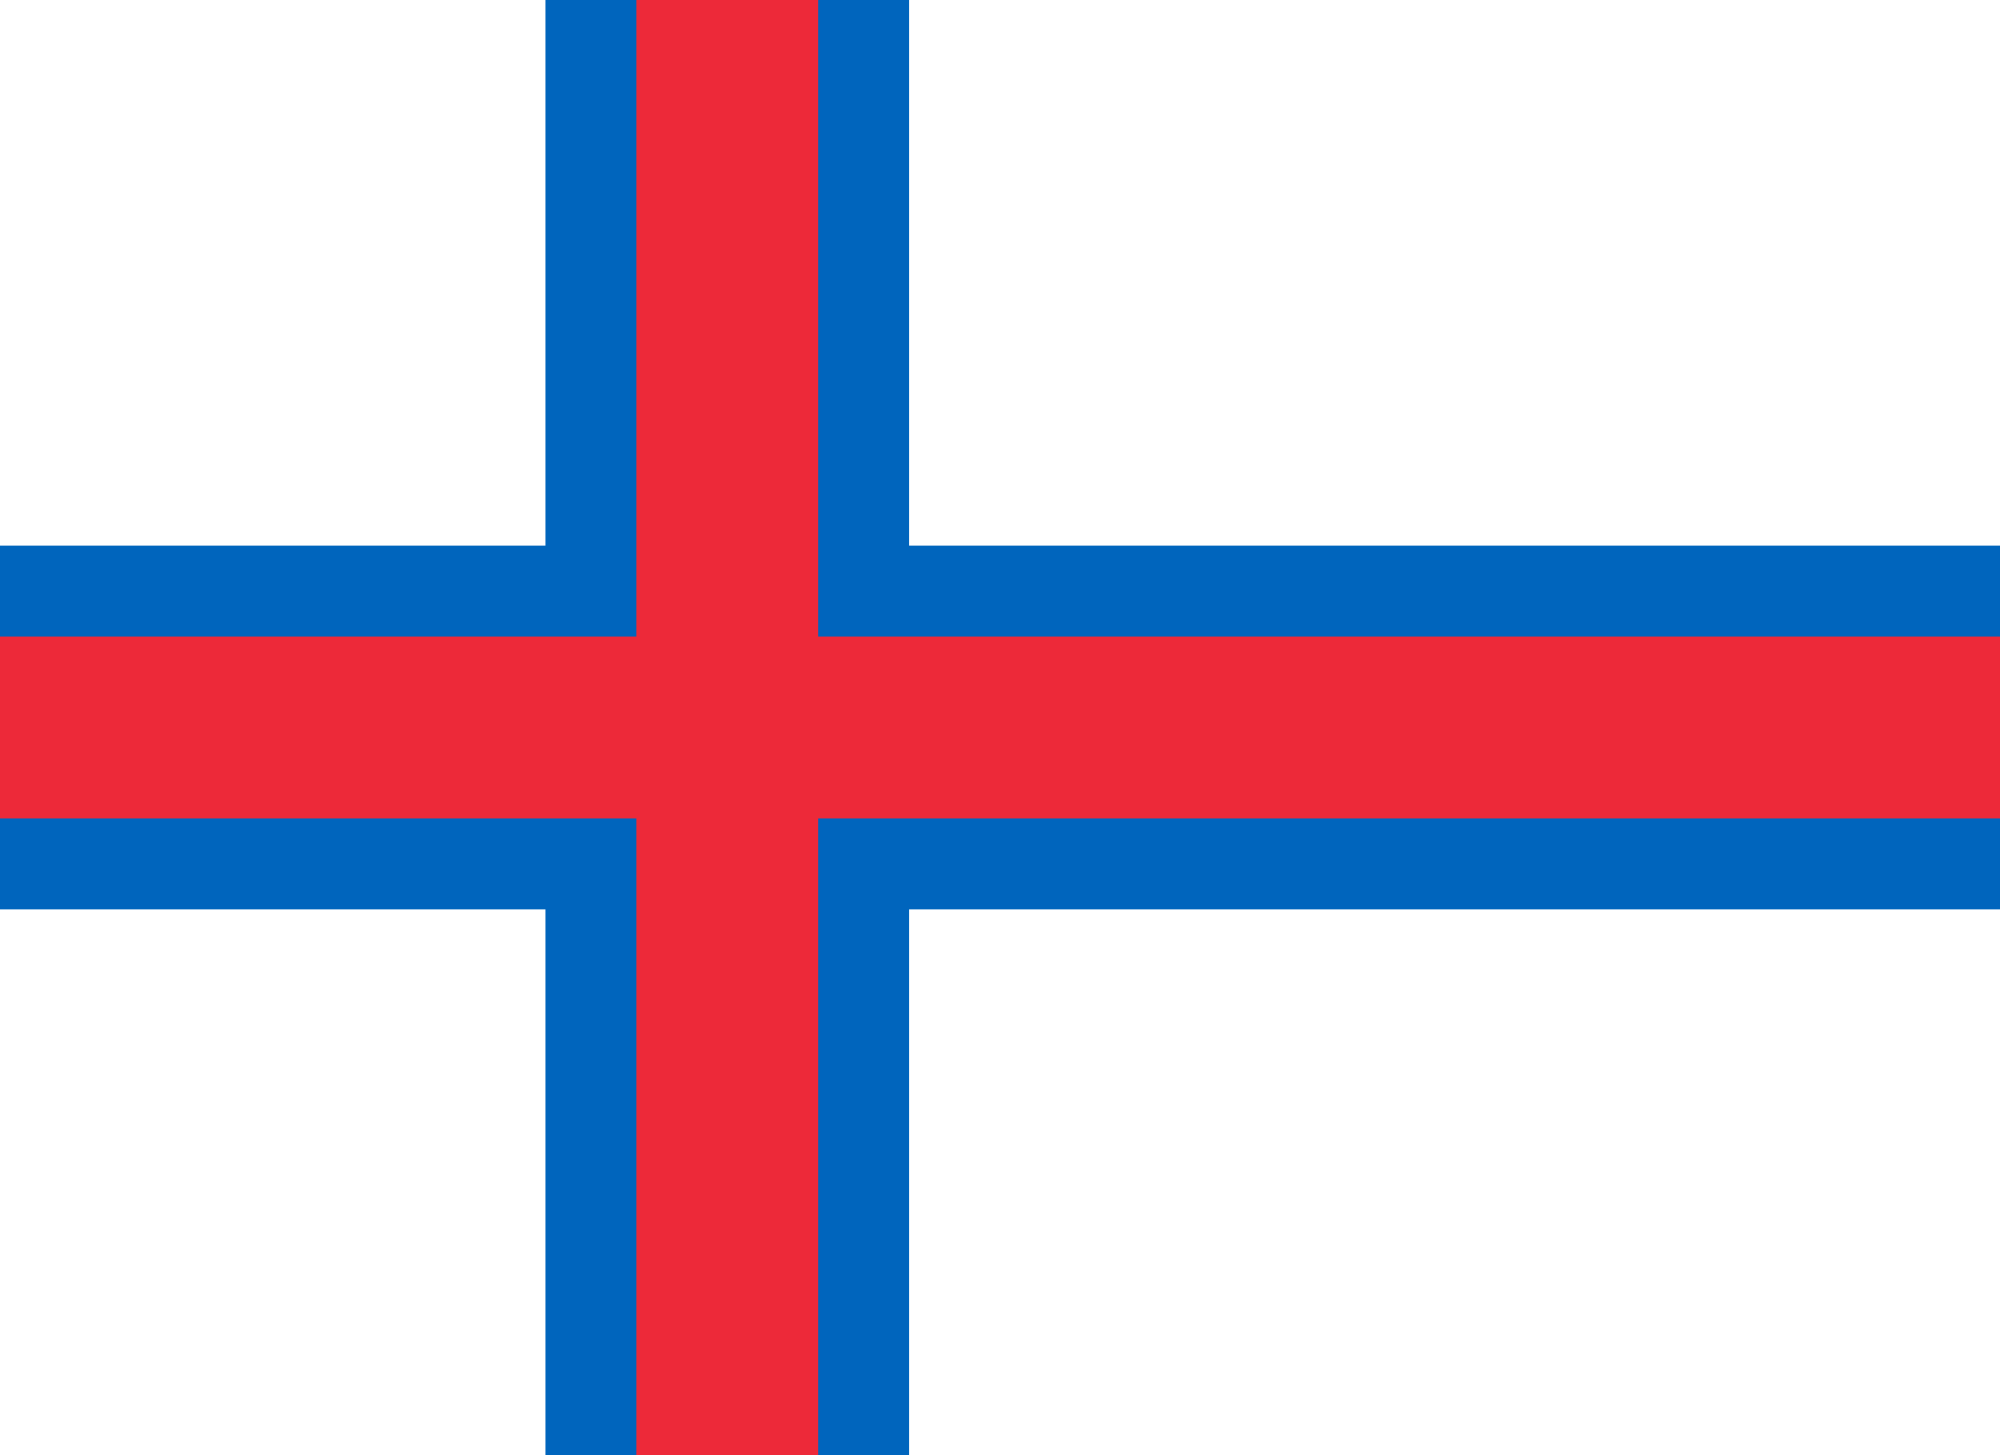 islas feroe, देश, emblema, लोग�प्रतीकbolo - HD वॉलपेपर - प्रोफेसर-falken.com